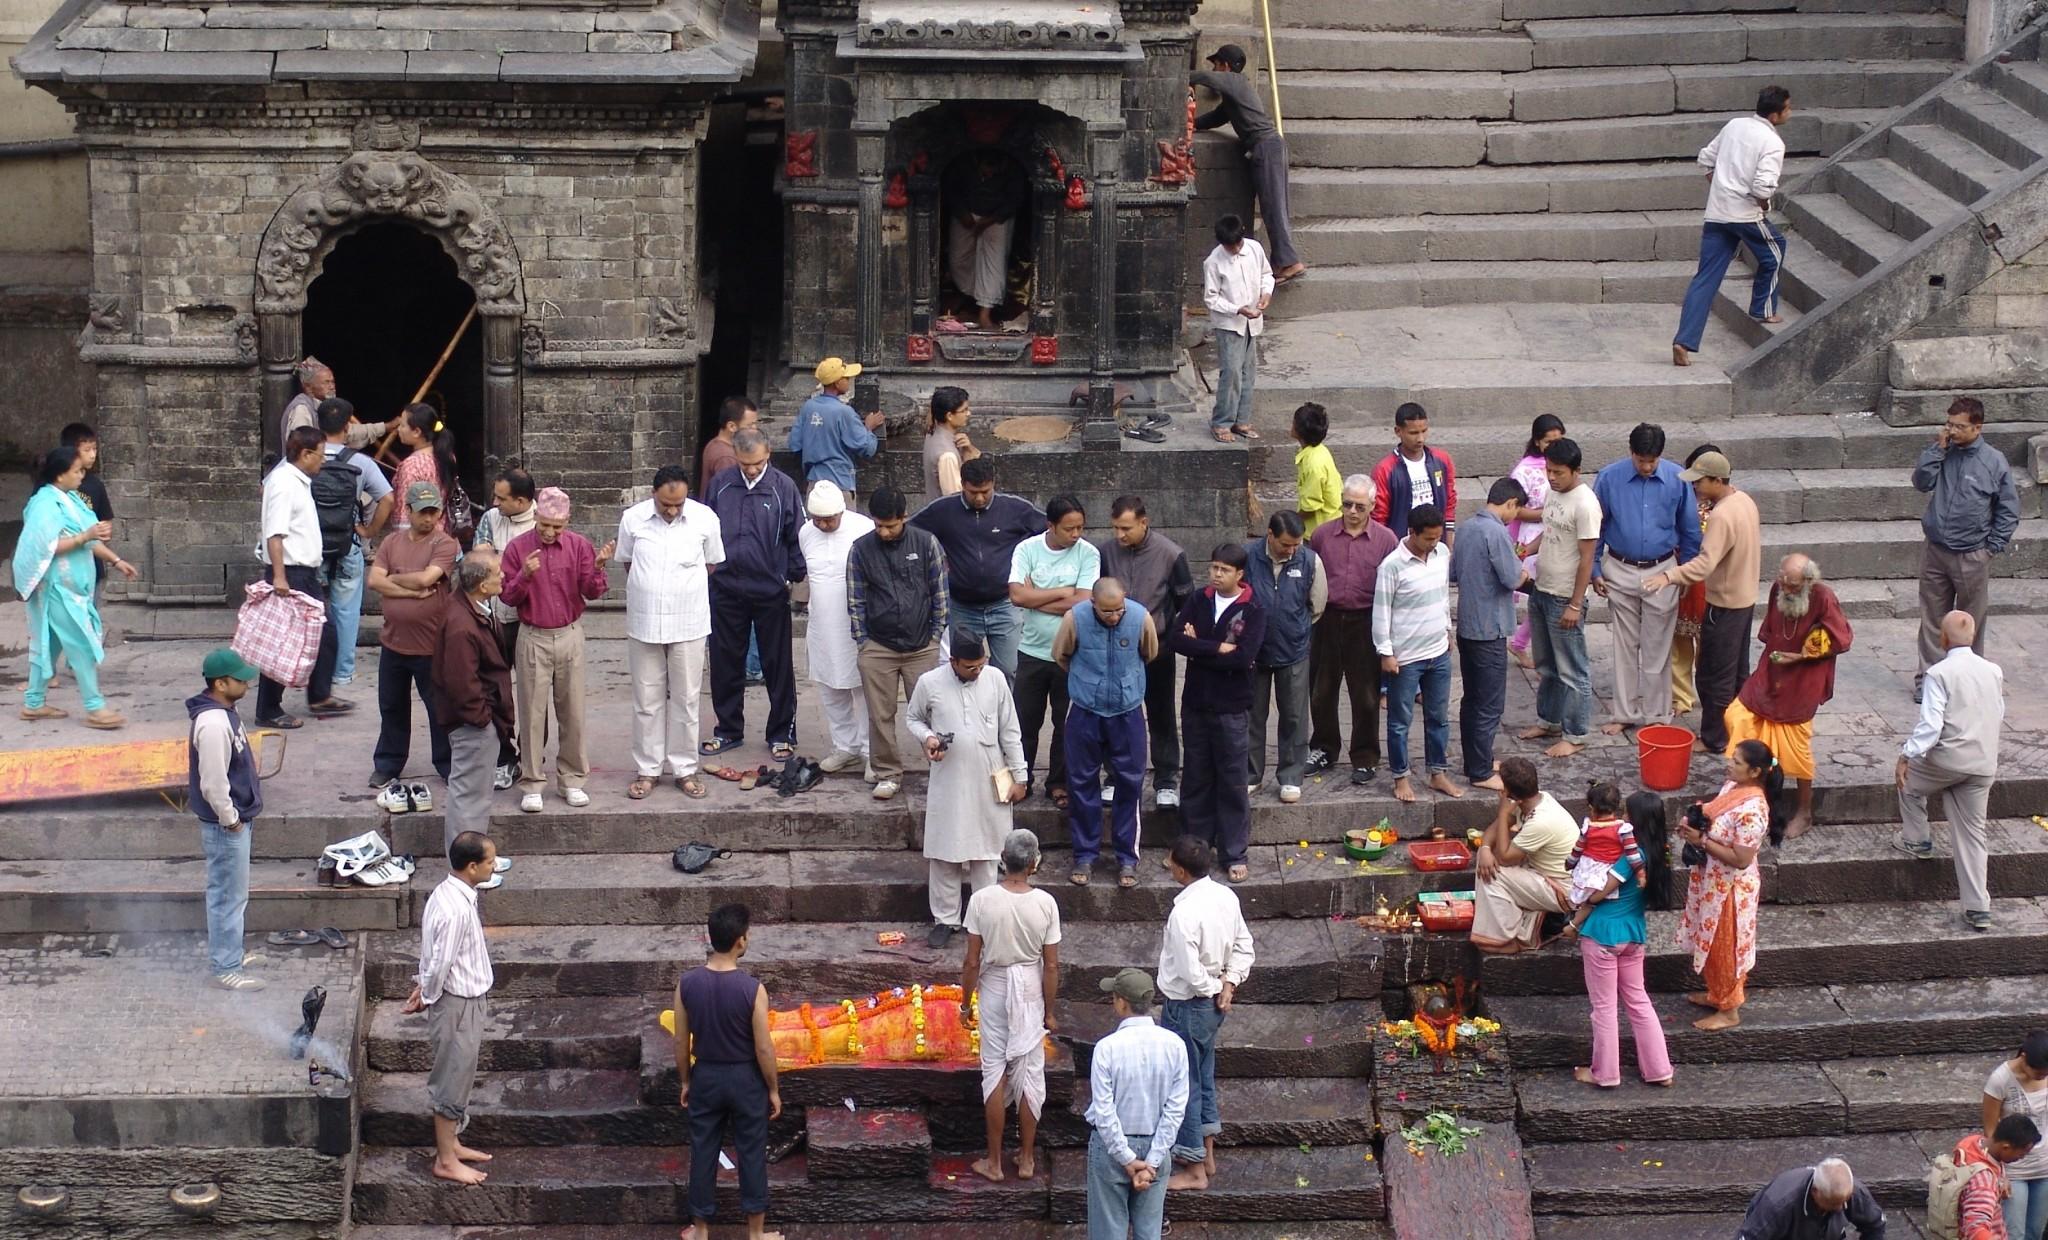 pashupatinath cremation